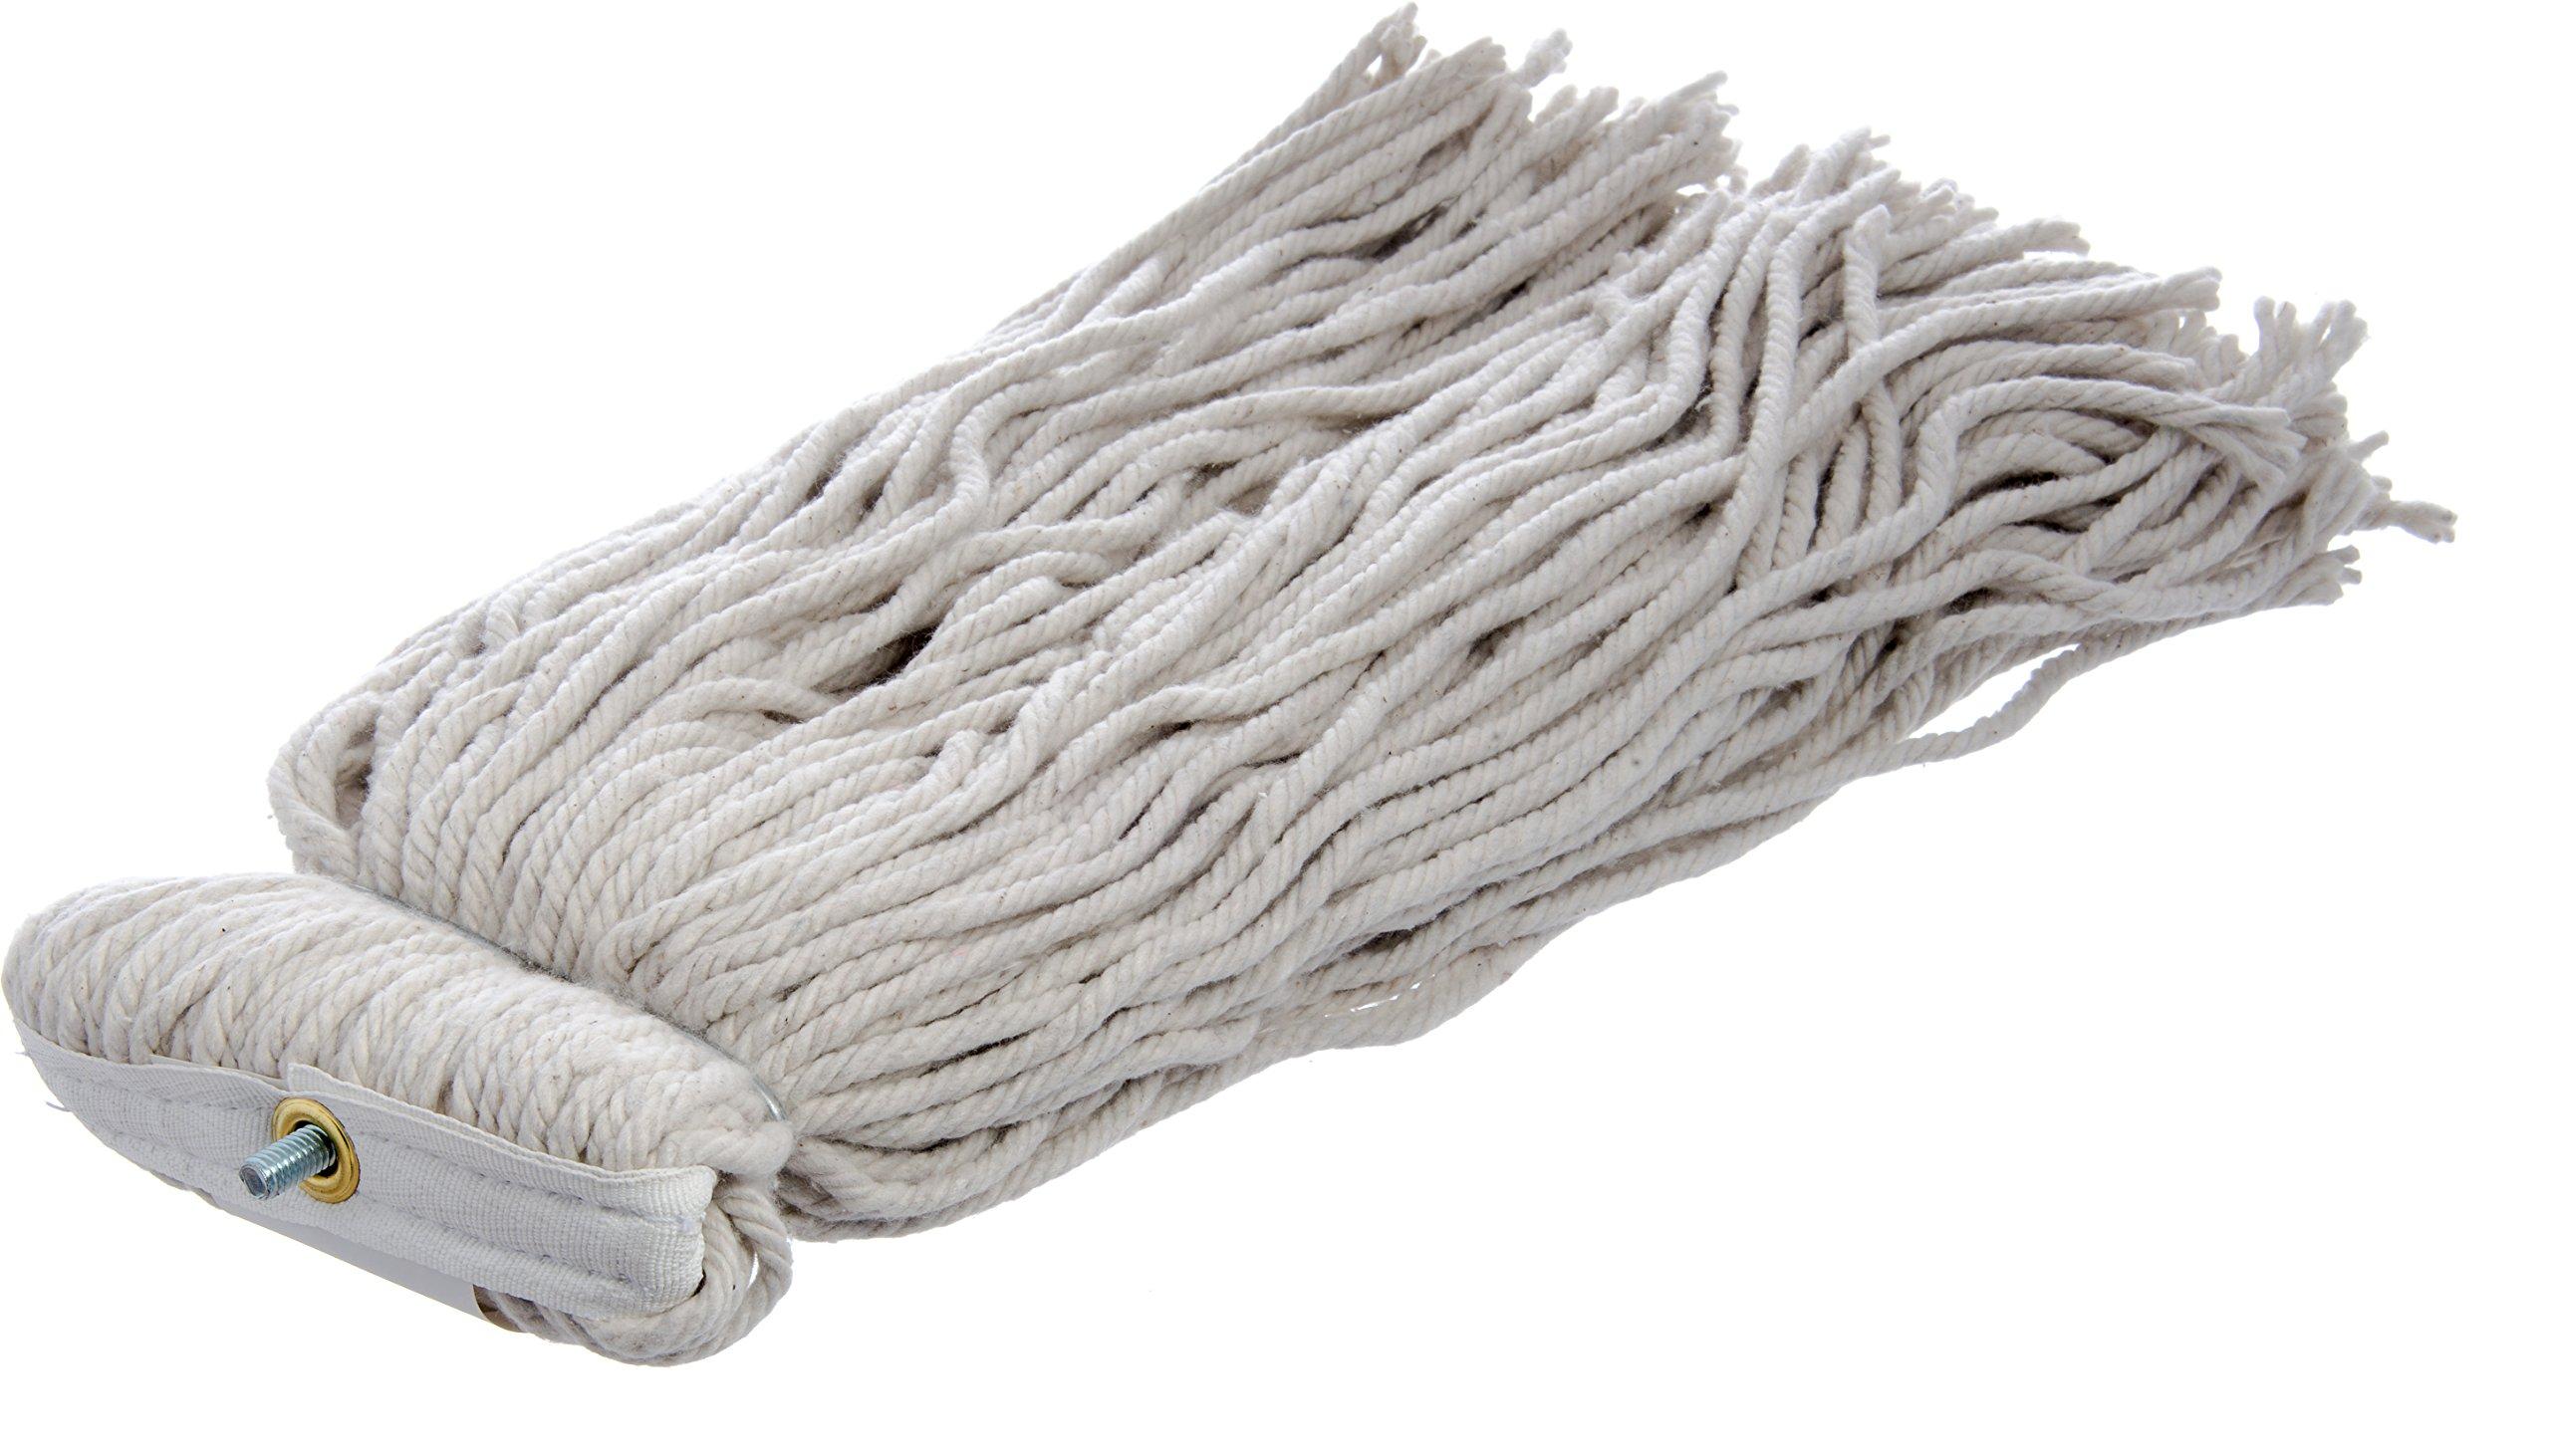 Carlisle 369024C00 Flo-Pac Kwik-On #24 Cotton Screw Top Cut-End Wet Mop, 18'' Length (Pack of 12) by Carlisle (Image #2)